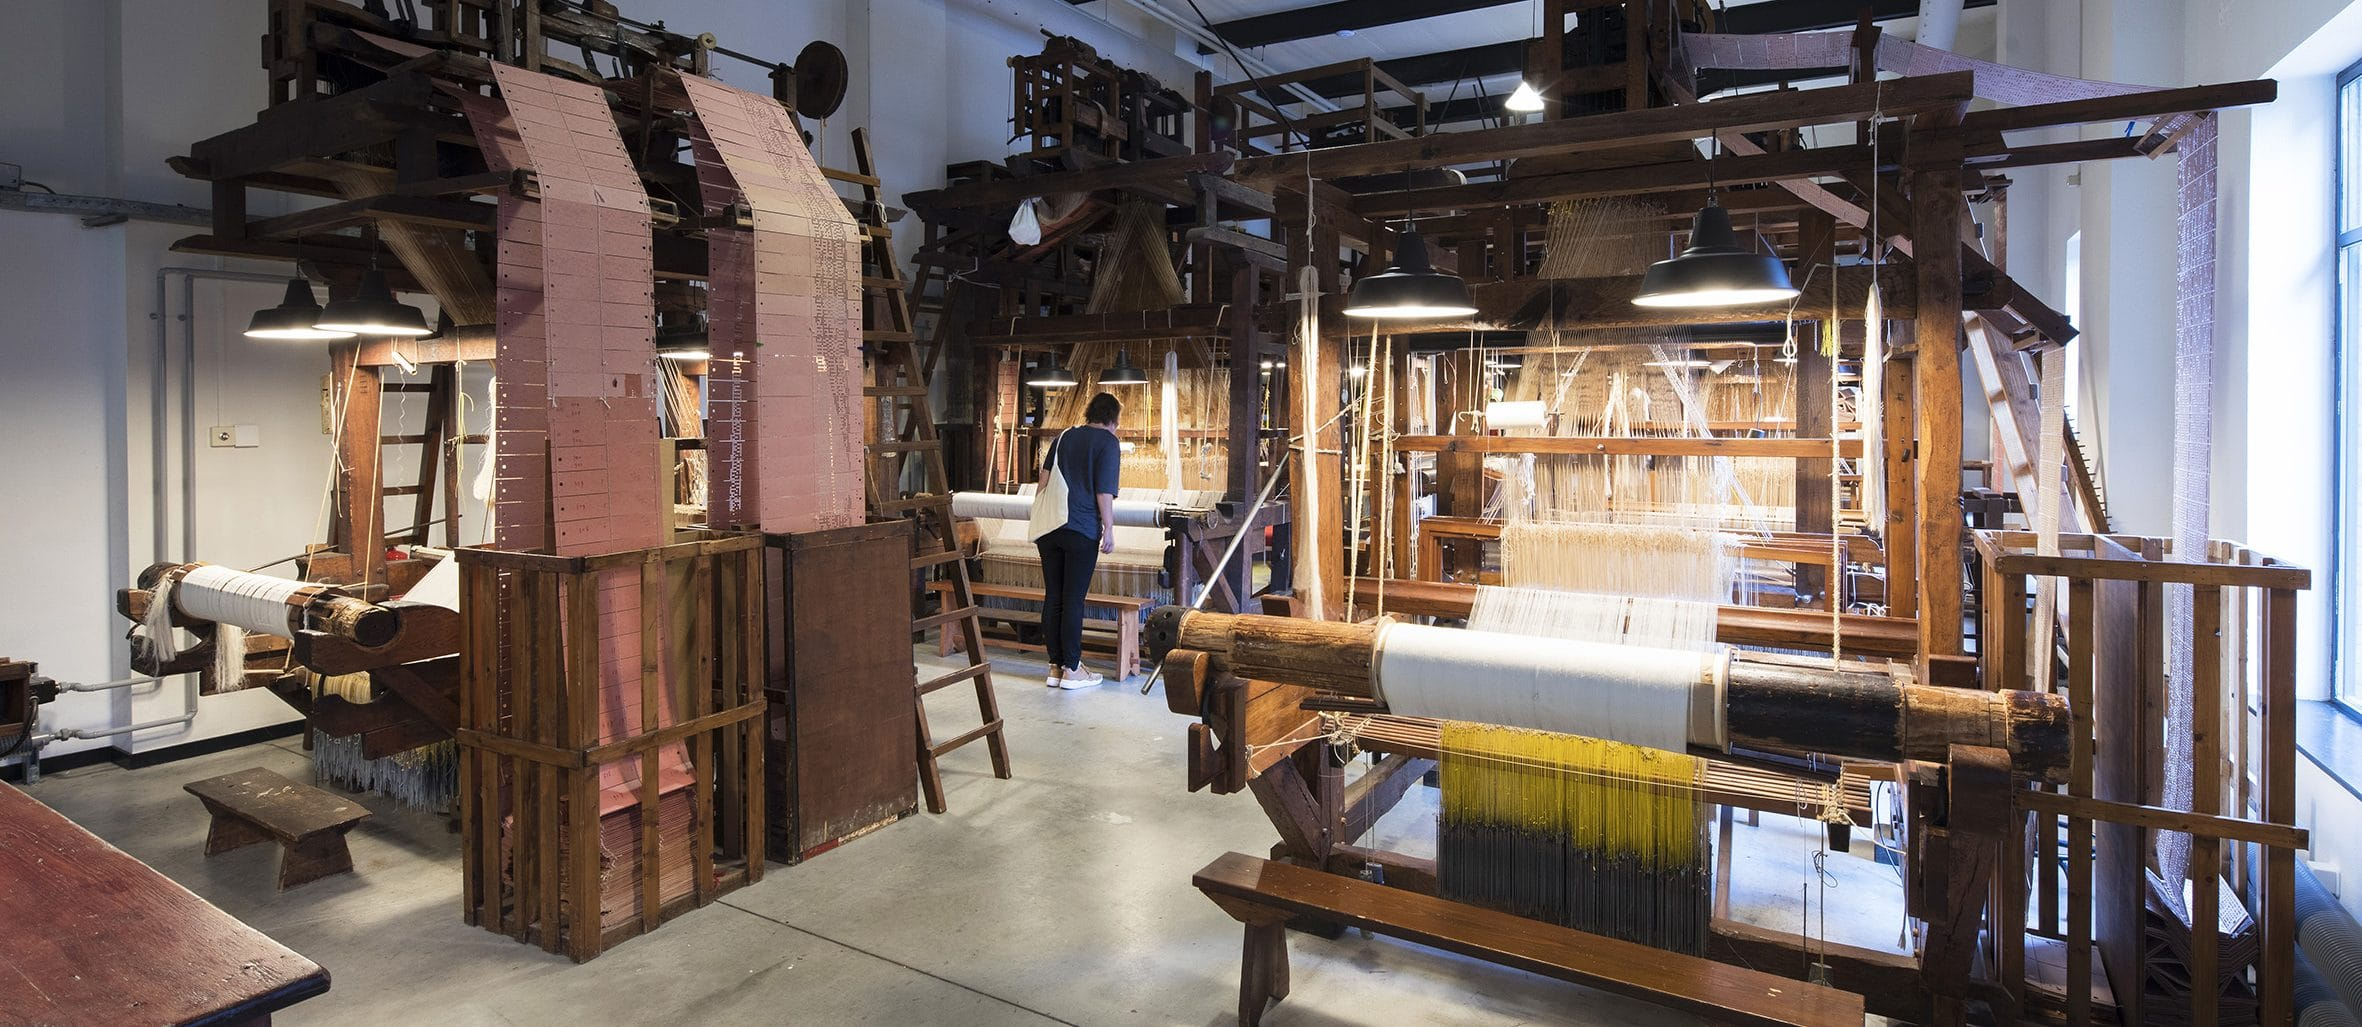 Damastweverij TextielMuseum